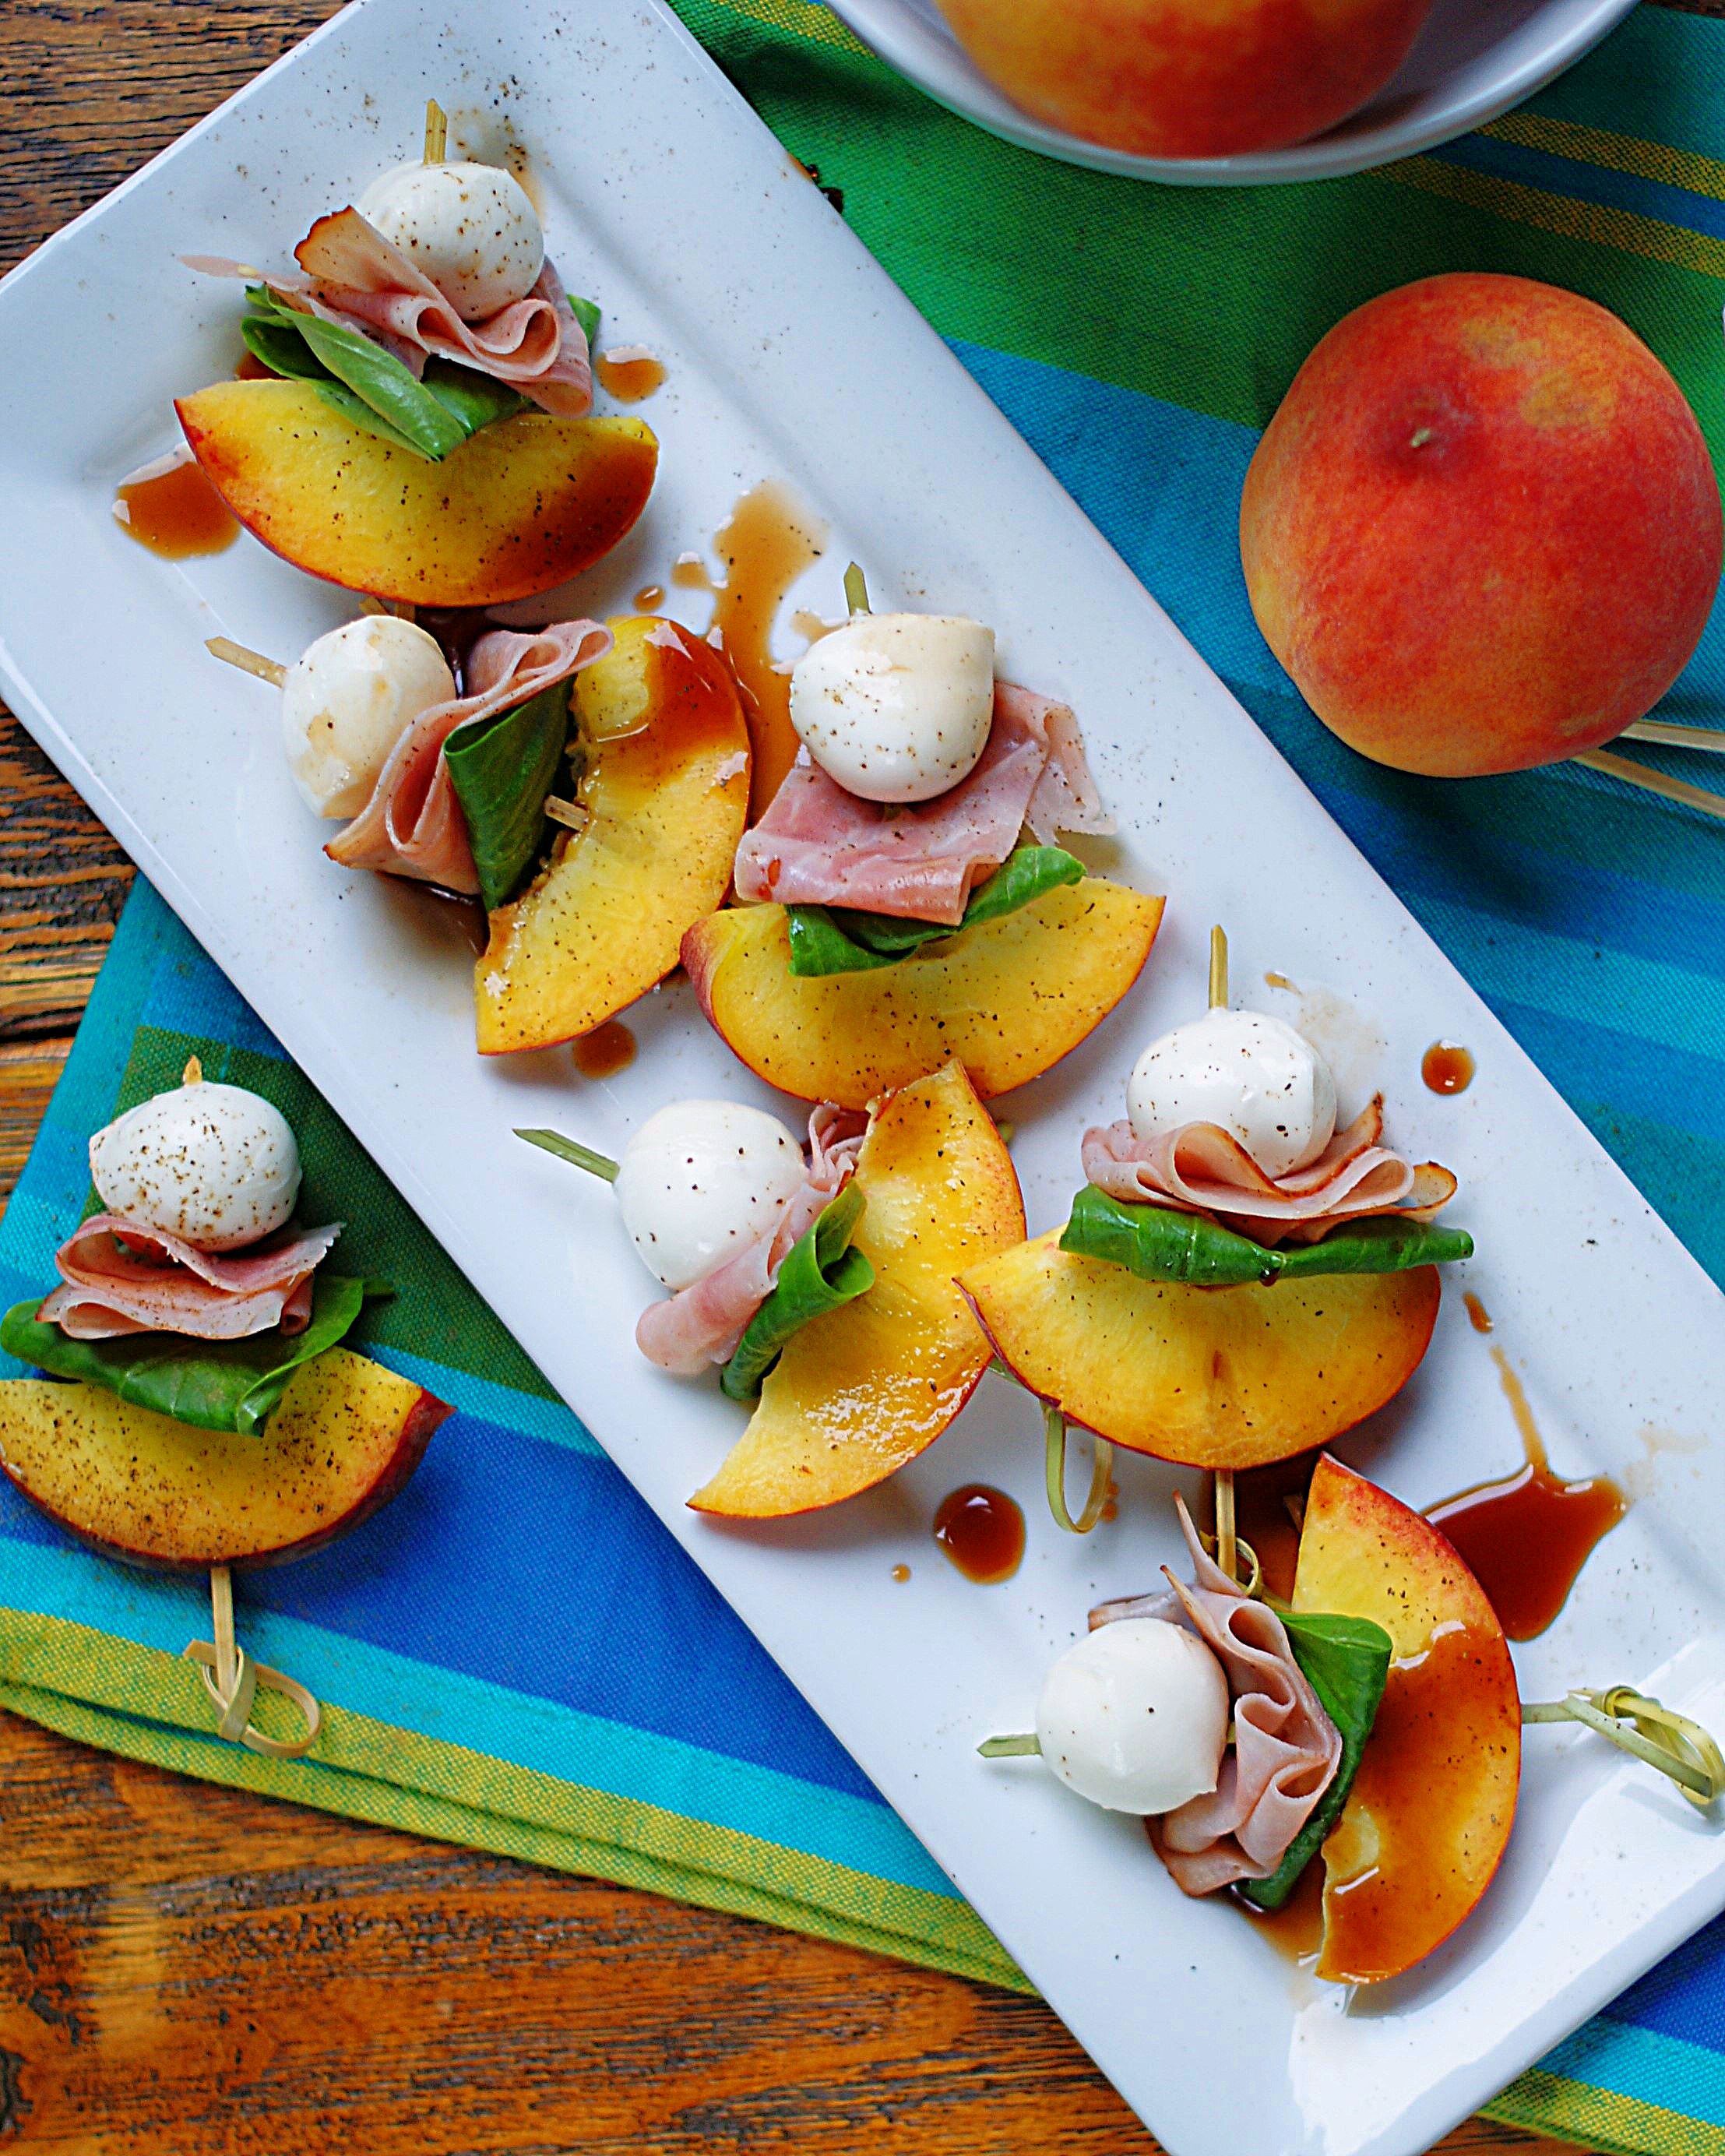 Peach Skewers with Ham & Mozzarella